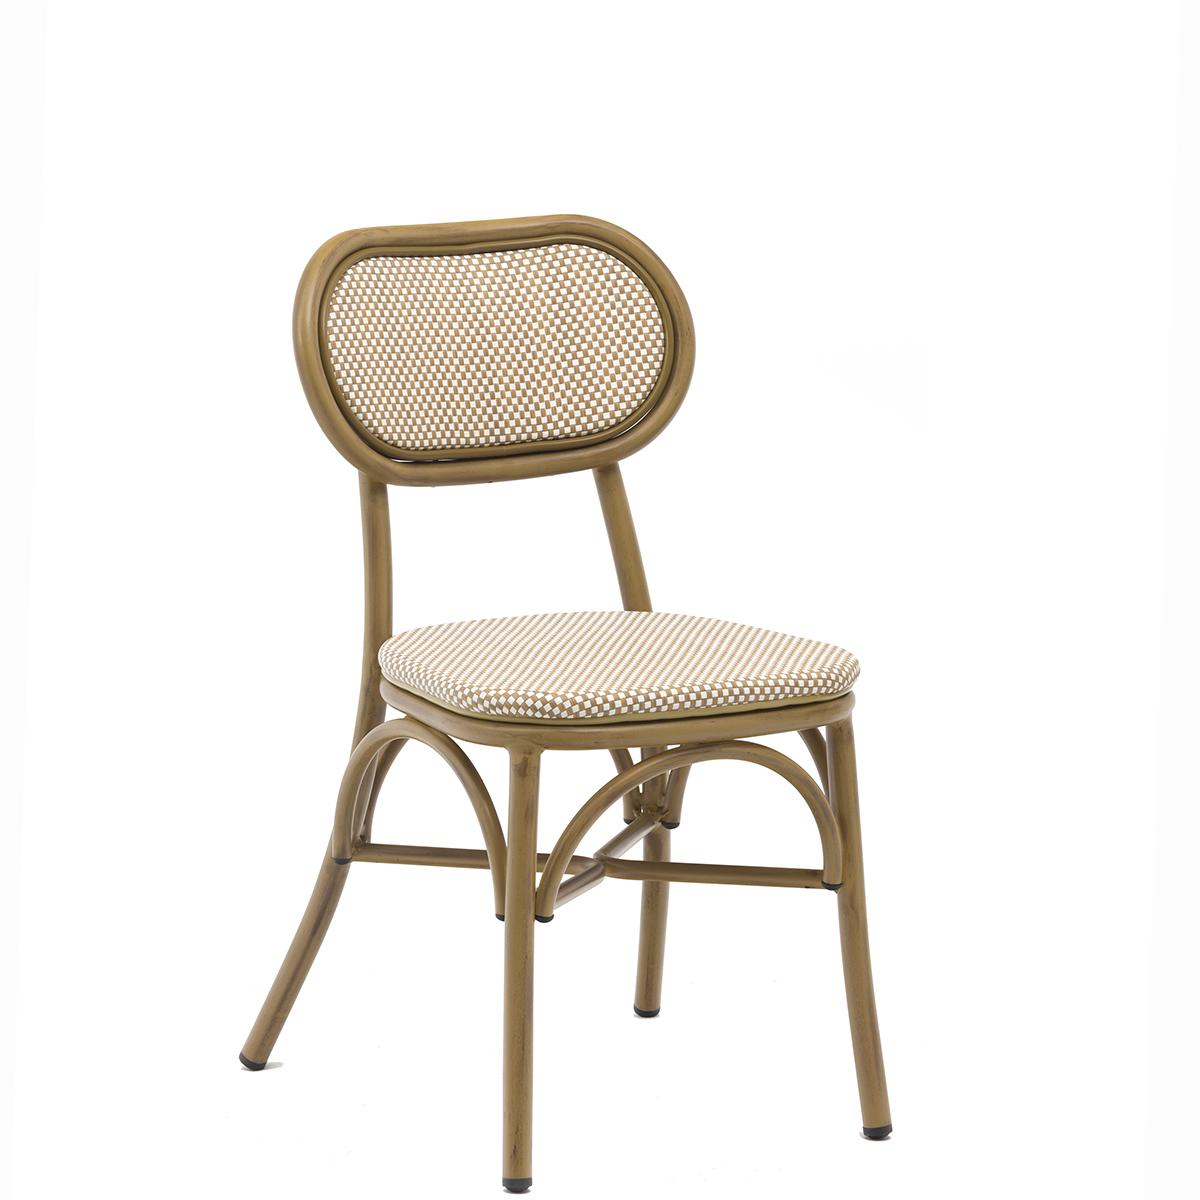 verdi-silla-deco-bamb-respaldo-latte-asiento-latte